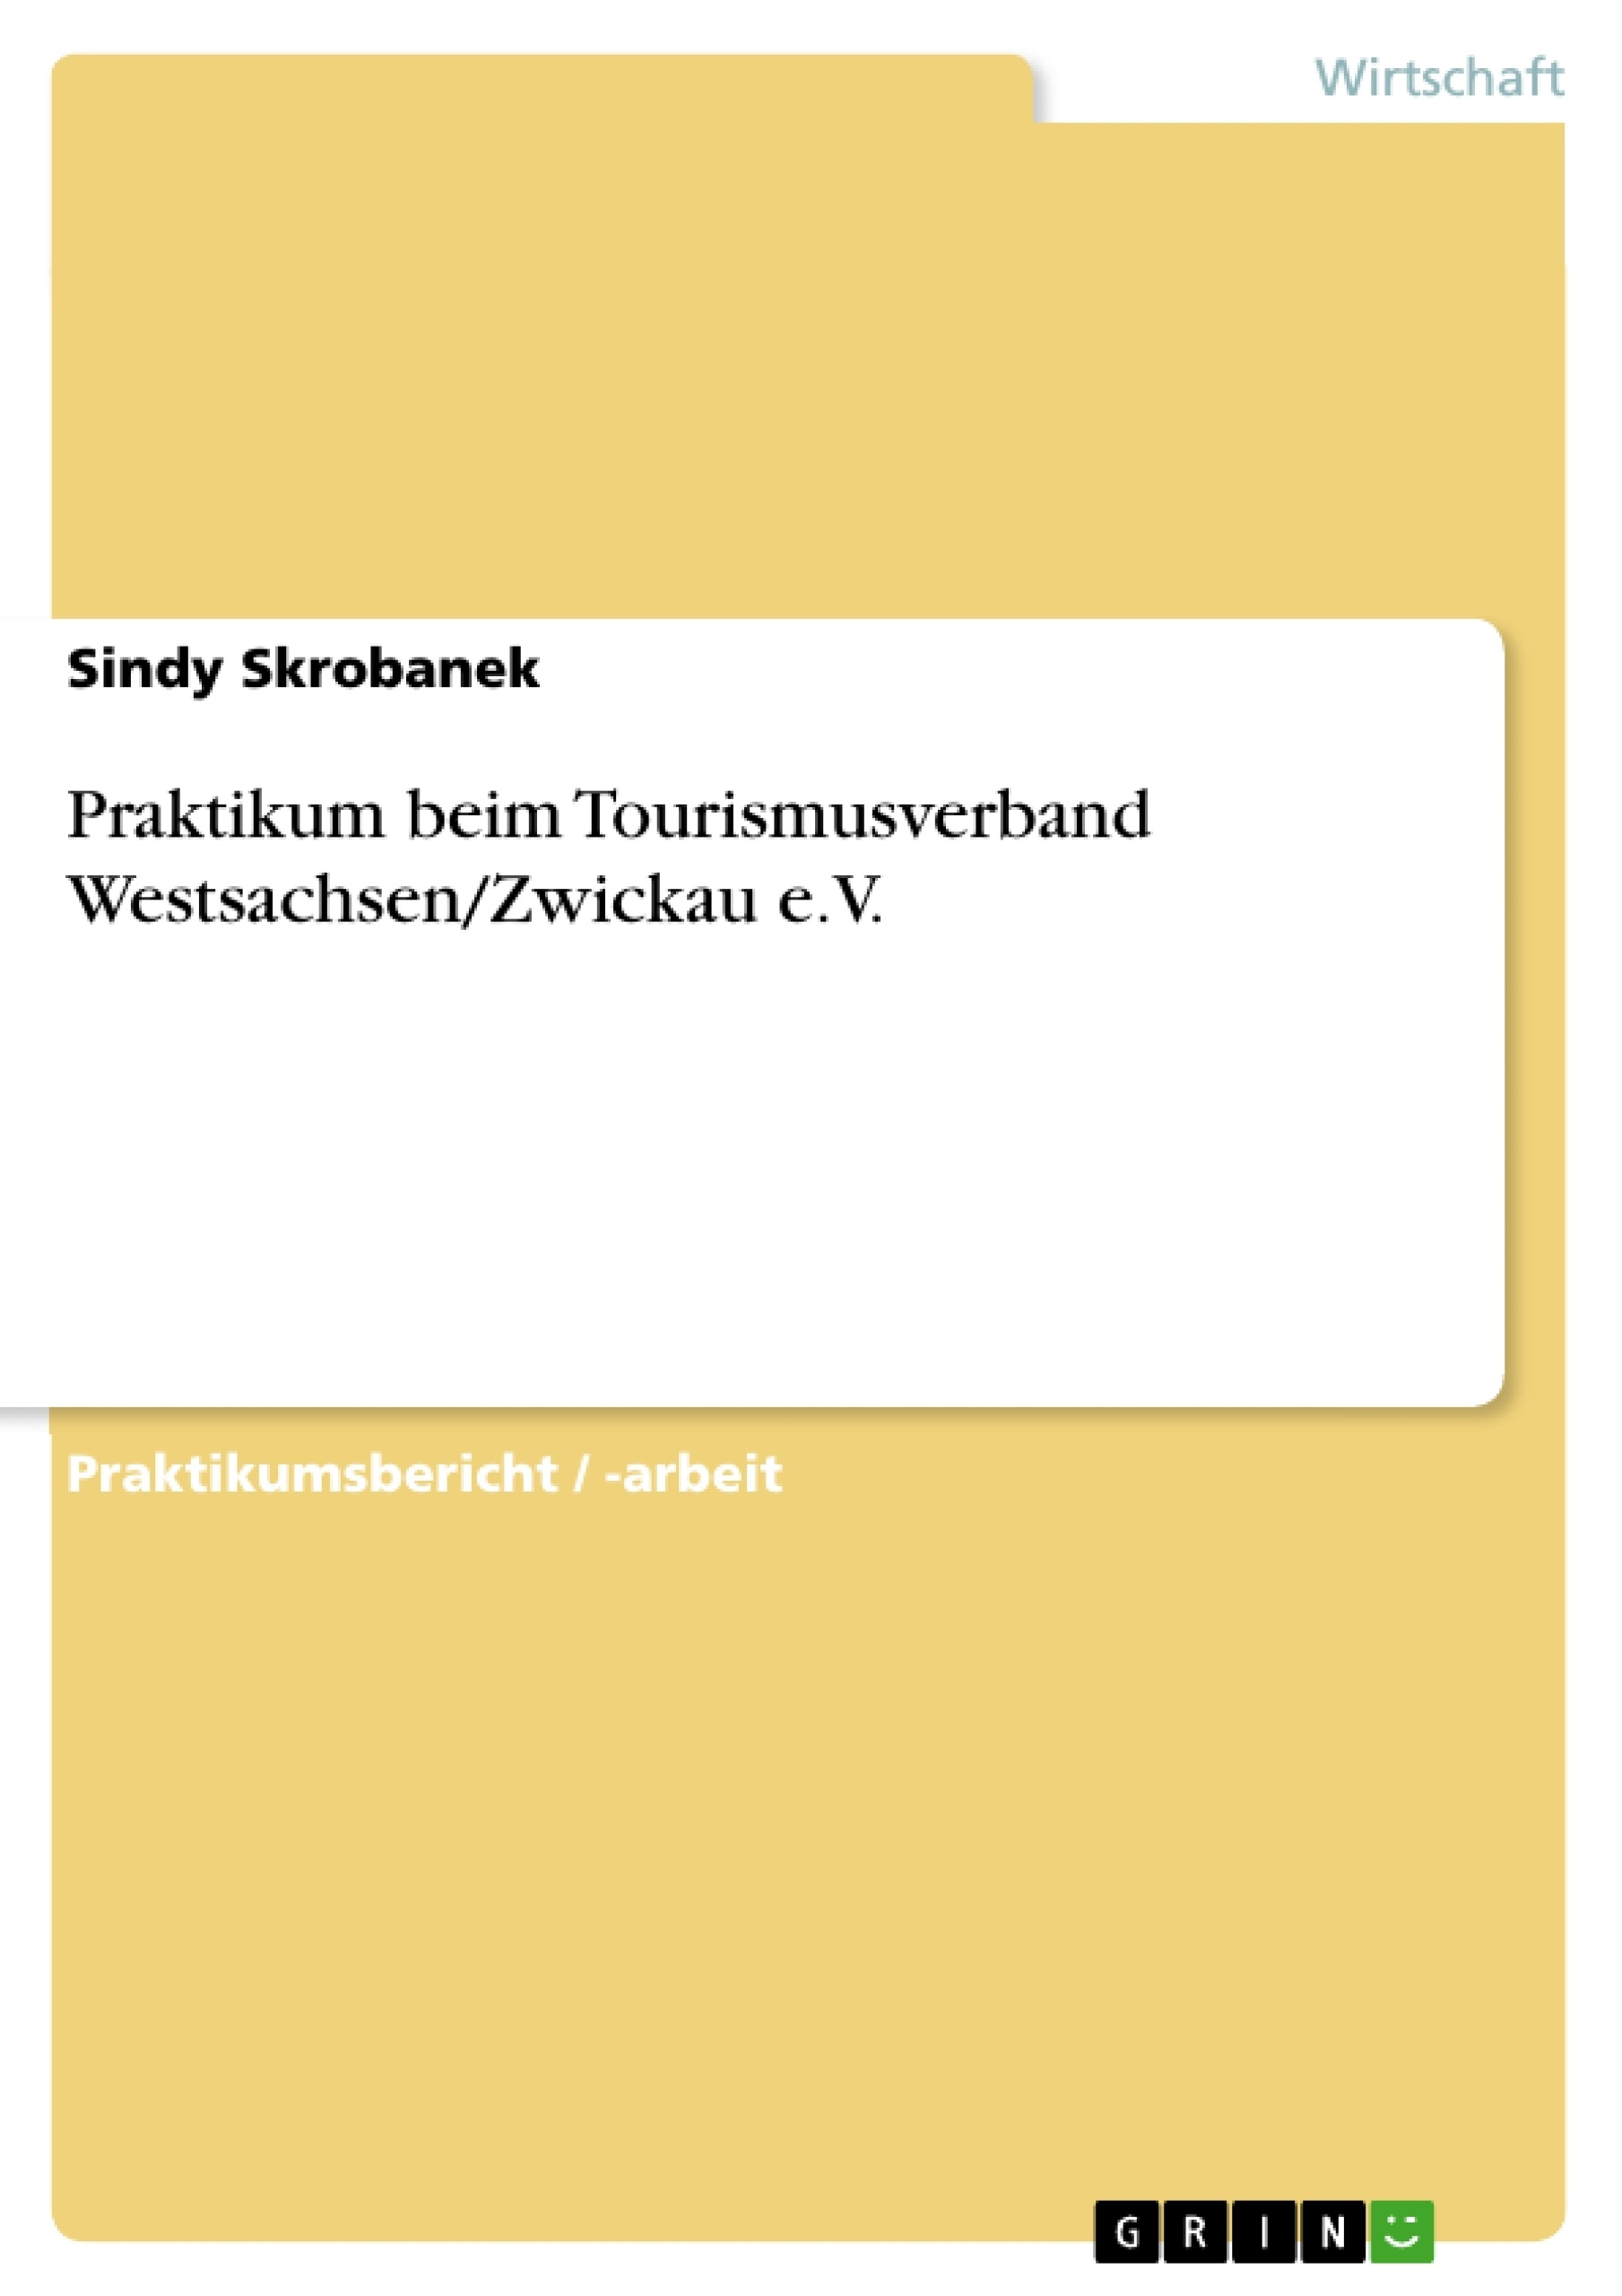 Titel: Praktikum beim Tourismusverband Westsachsen/Zwickau e.V.